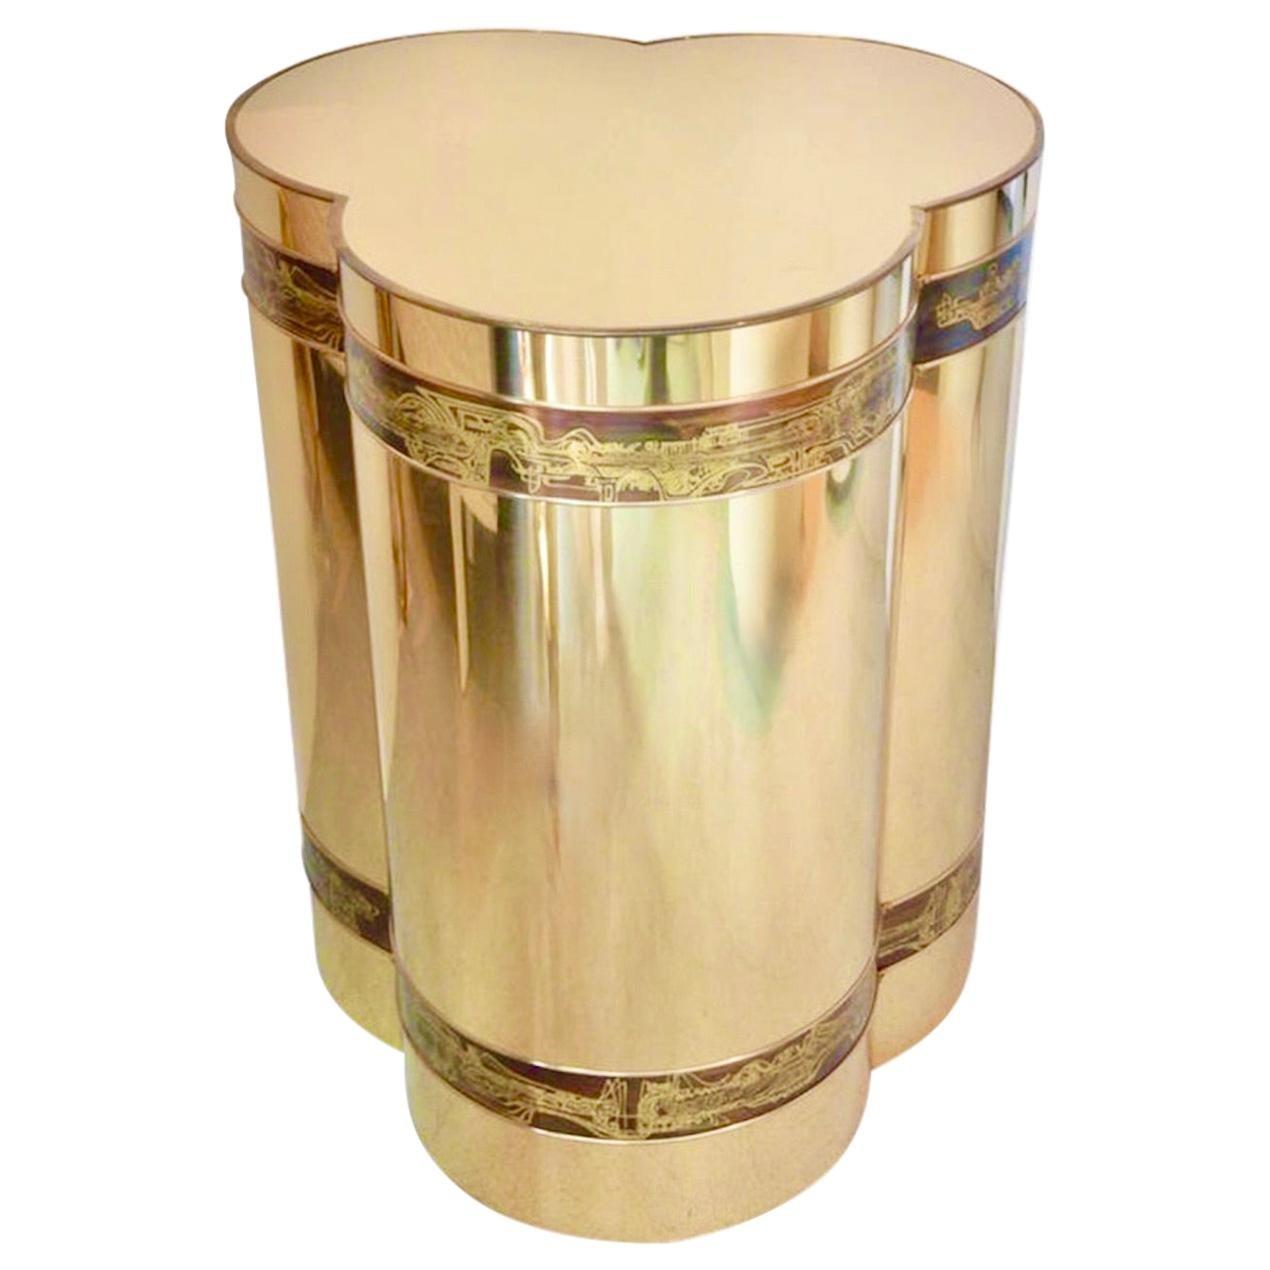 Mastercraft Brass Trefoil Table by Bernhard Rohne